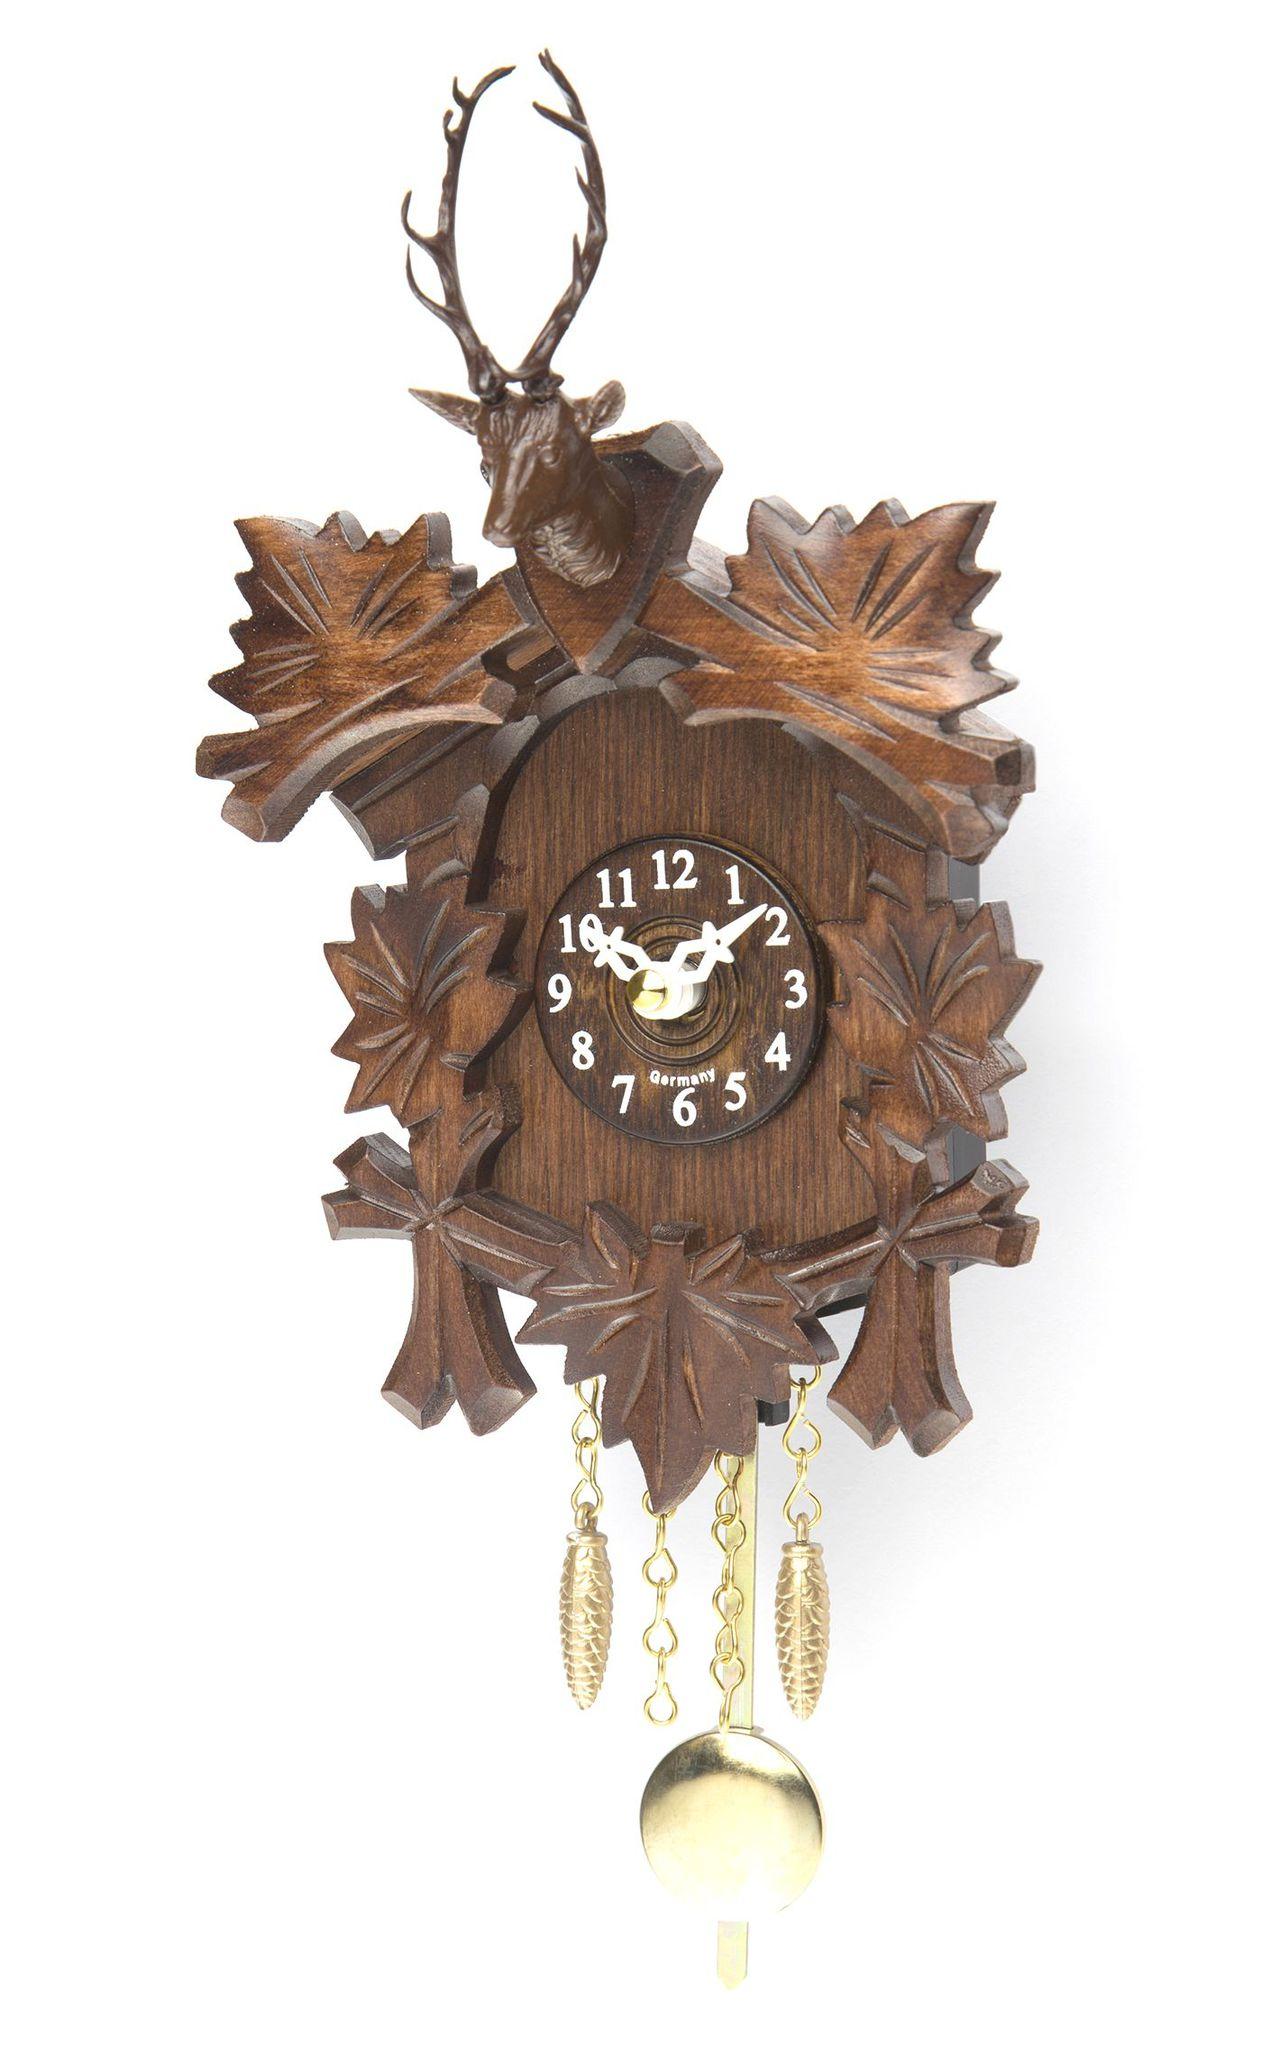 Часы настенные Часы настенные Tomas Stern 5015 chasy-nastennye-tomas-stern-5015-germaniya-tayvan.jpg